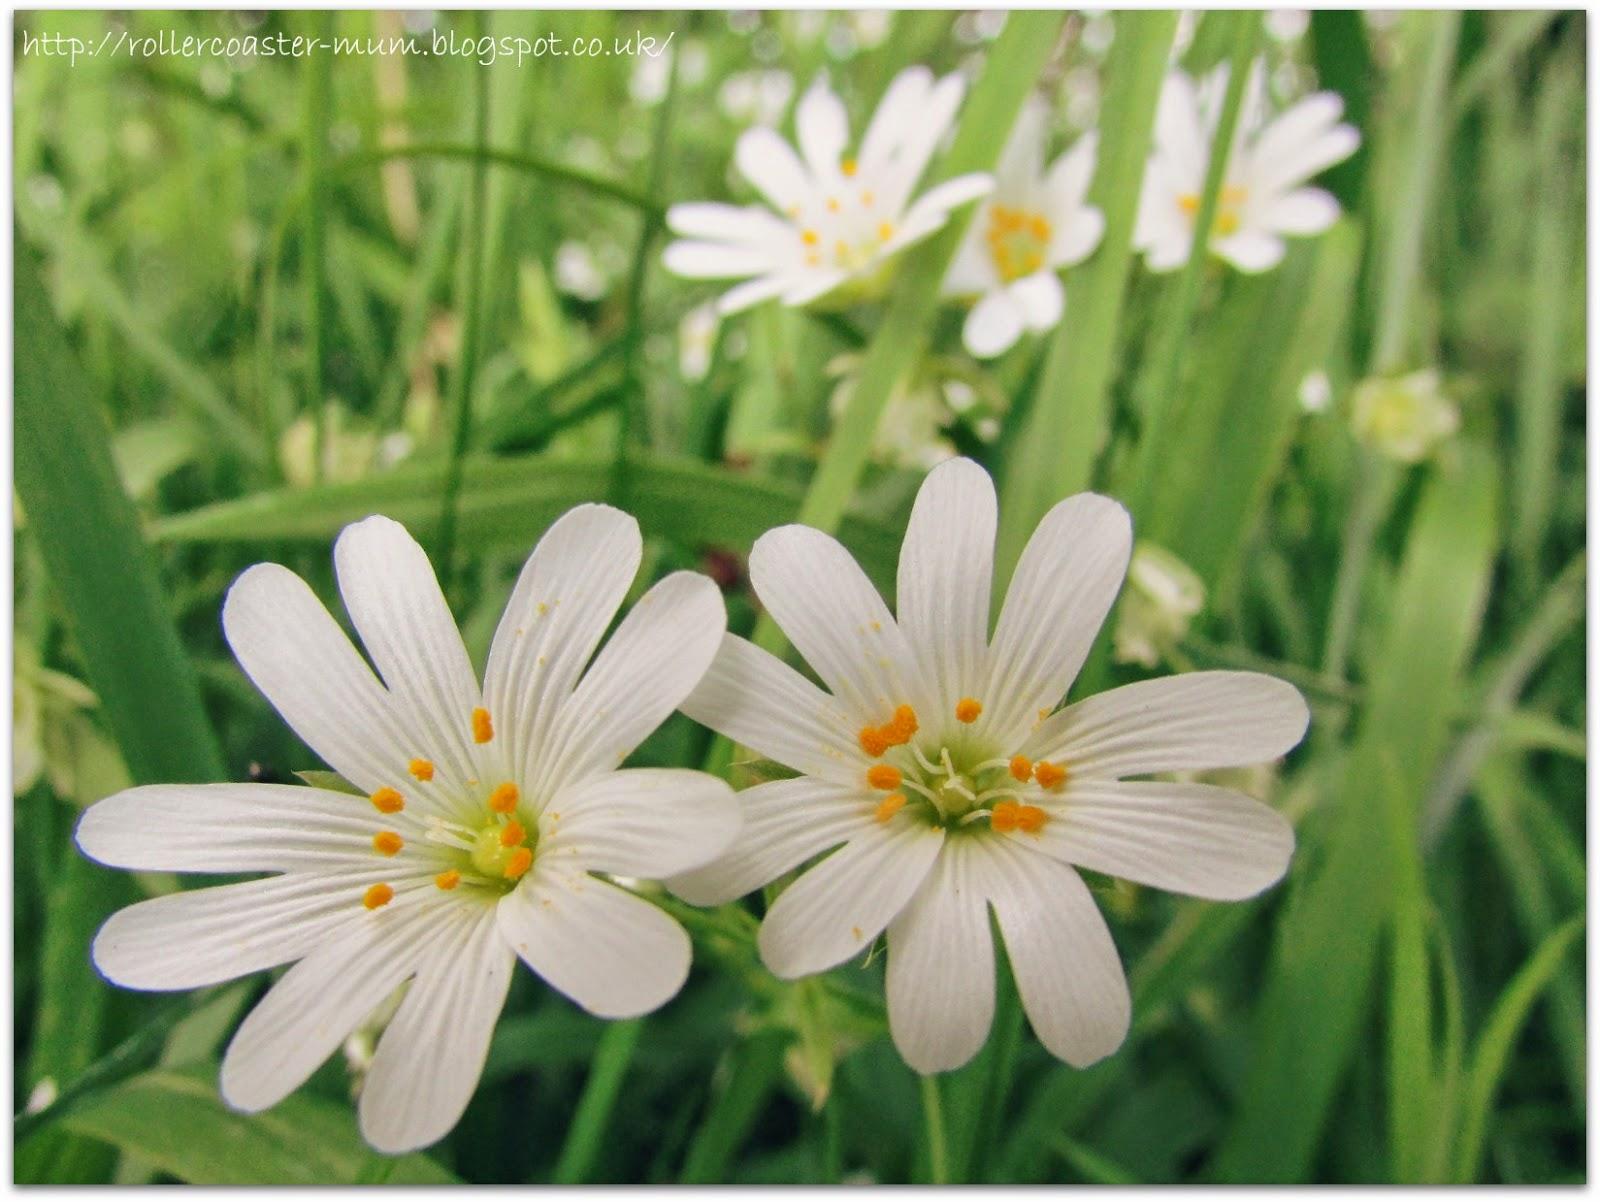 pretty star like Greater Stitchwort flowers, Stellaria holostea